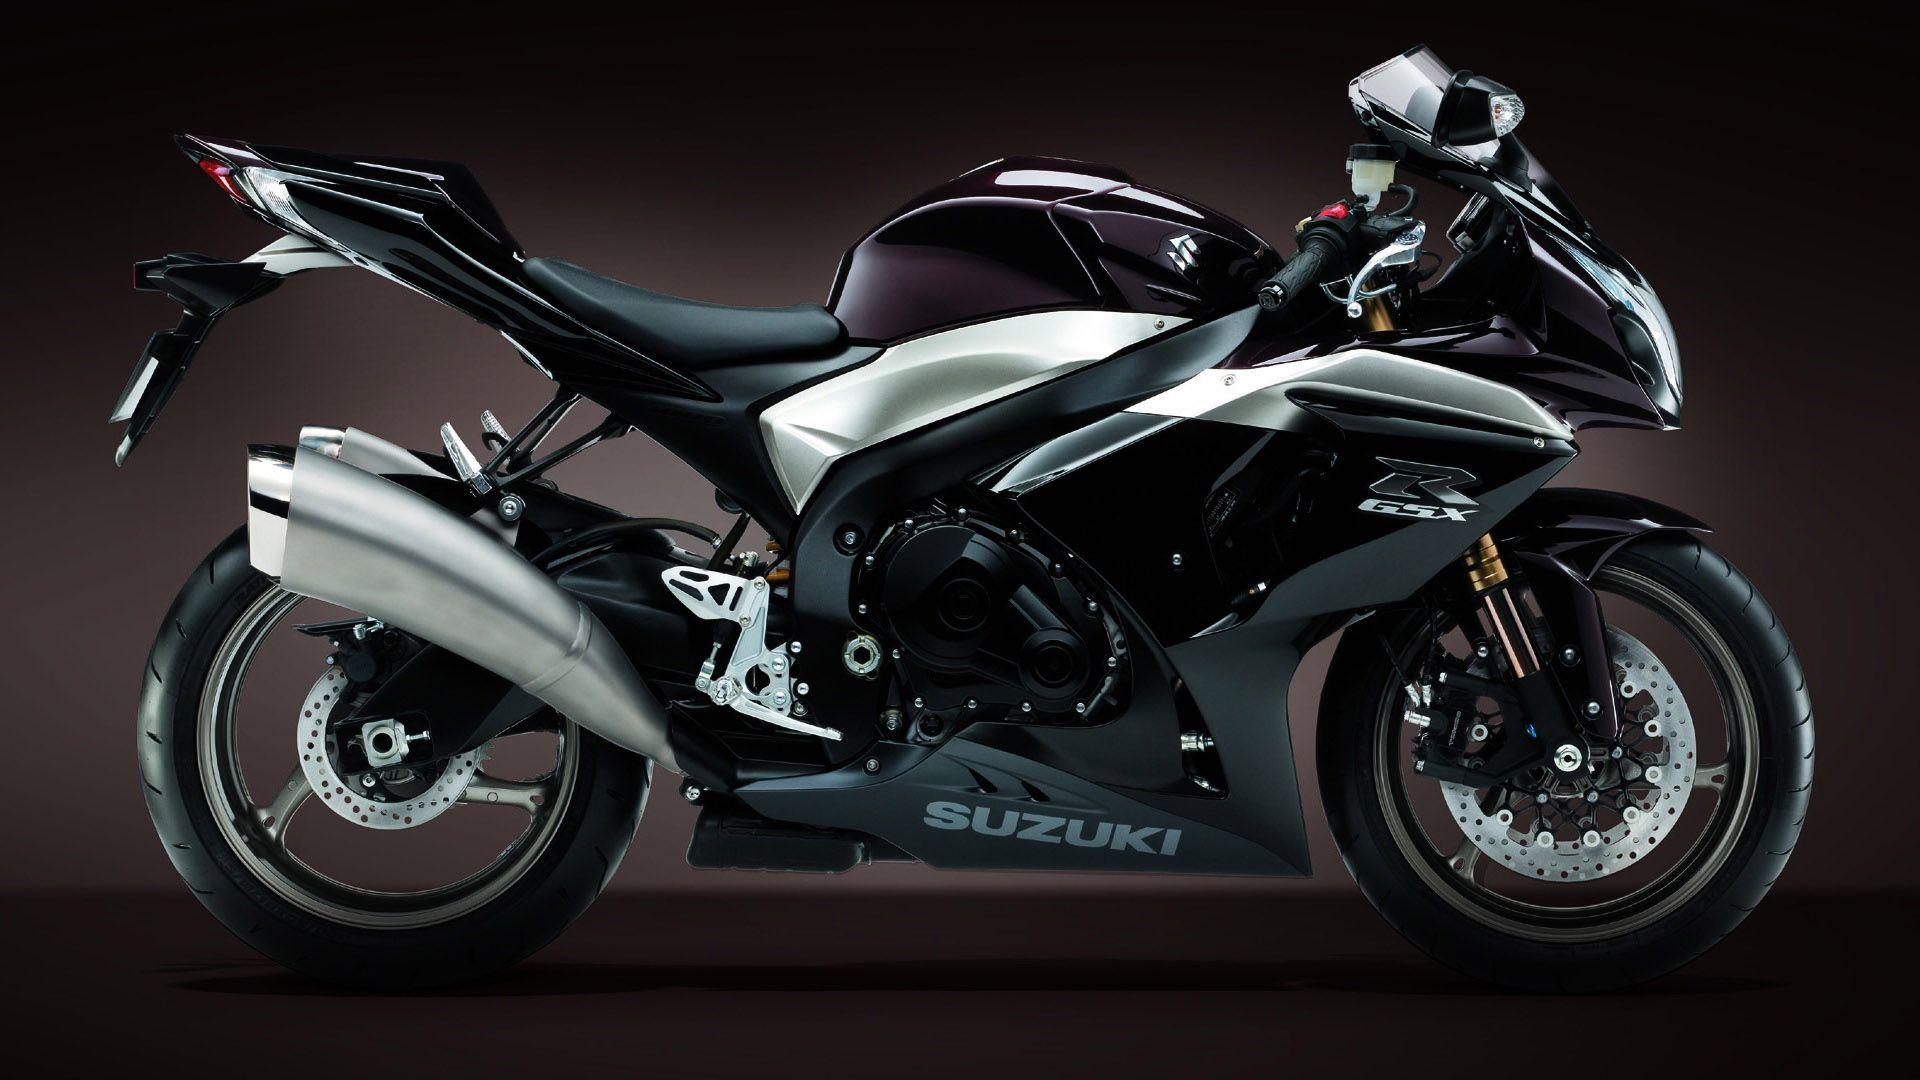 Hd Desktop Wallpaper Ventube Com Hd Suzuki Dark Bike Desktop